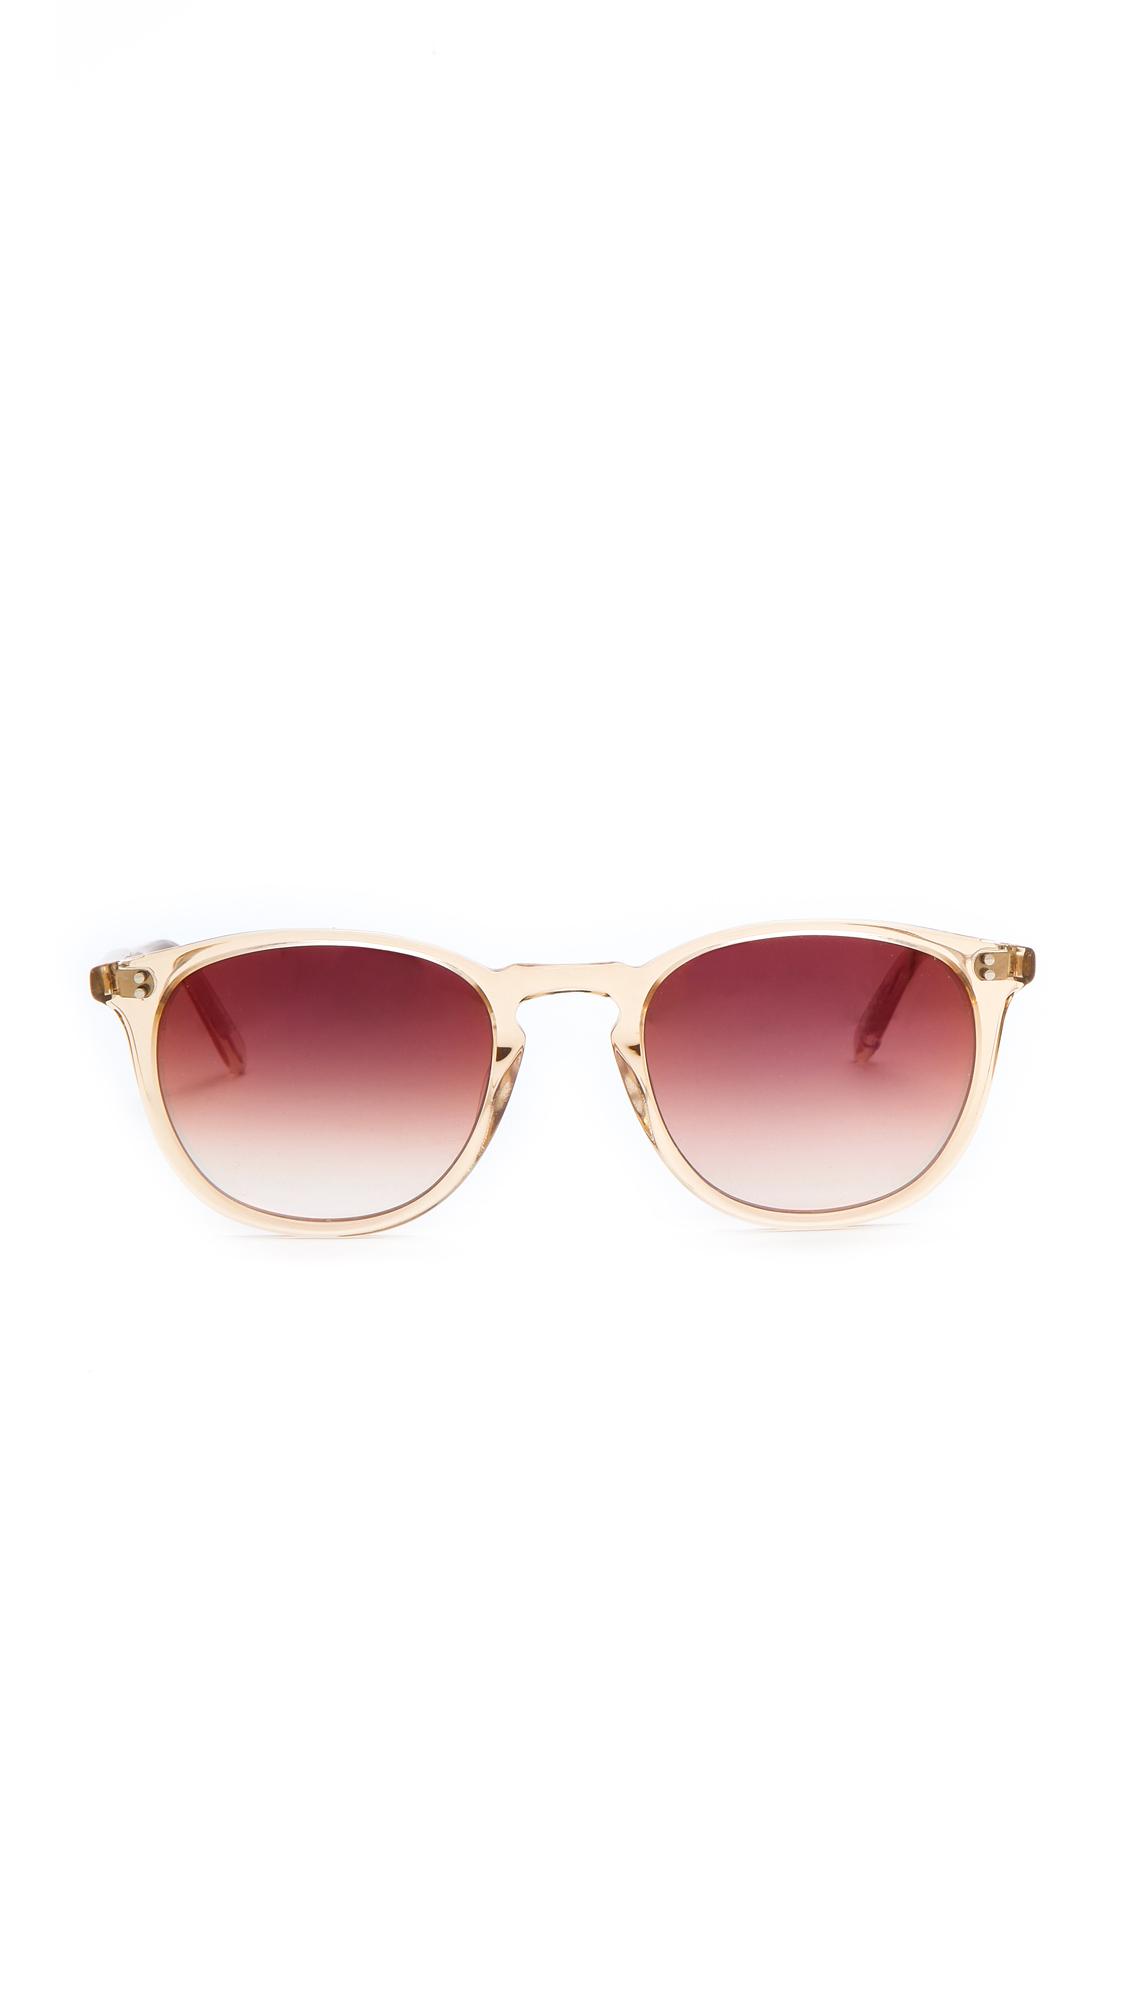 Garrett Leight Kinney Sunglasses in Metallic